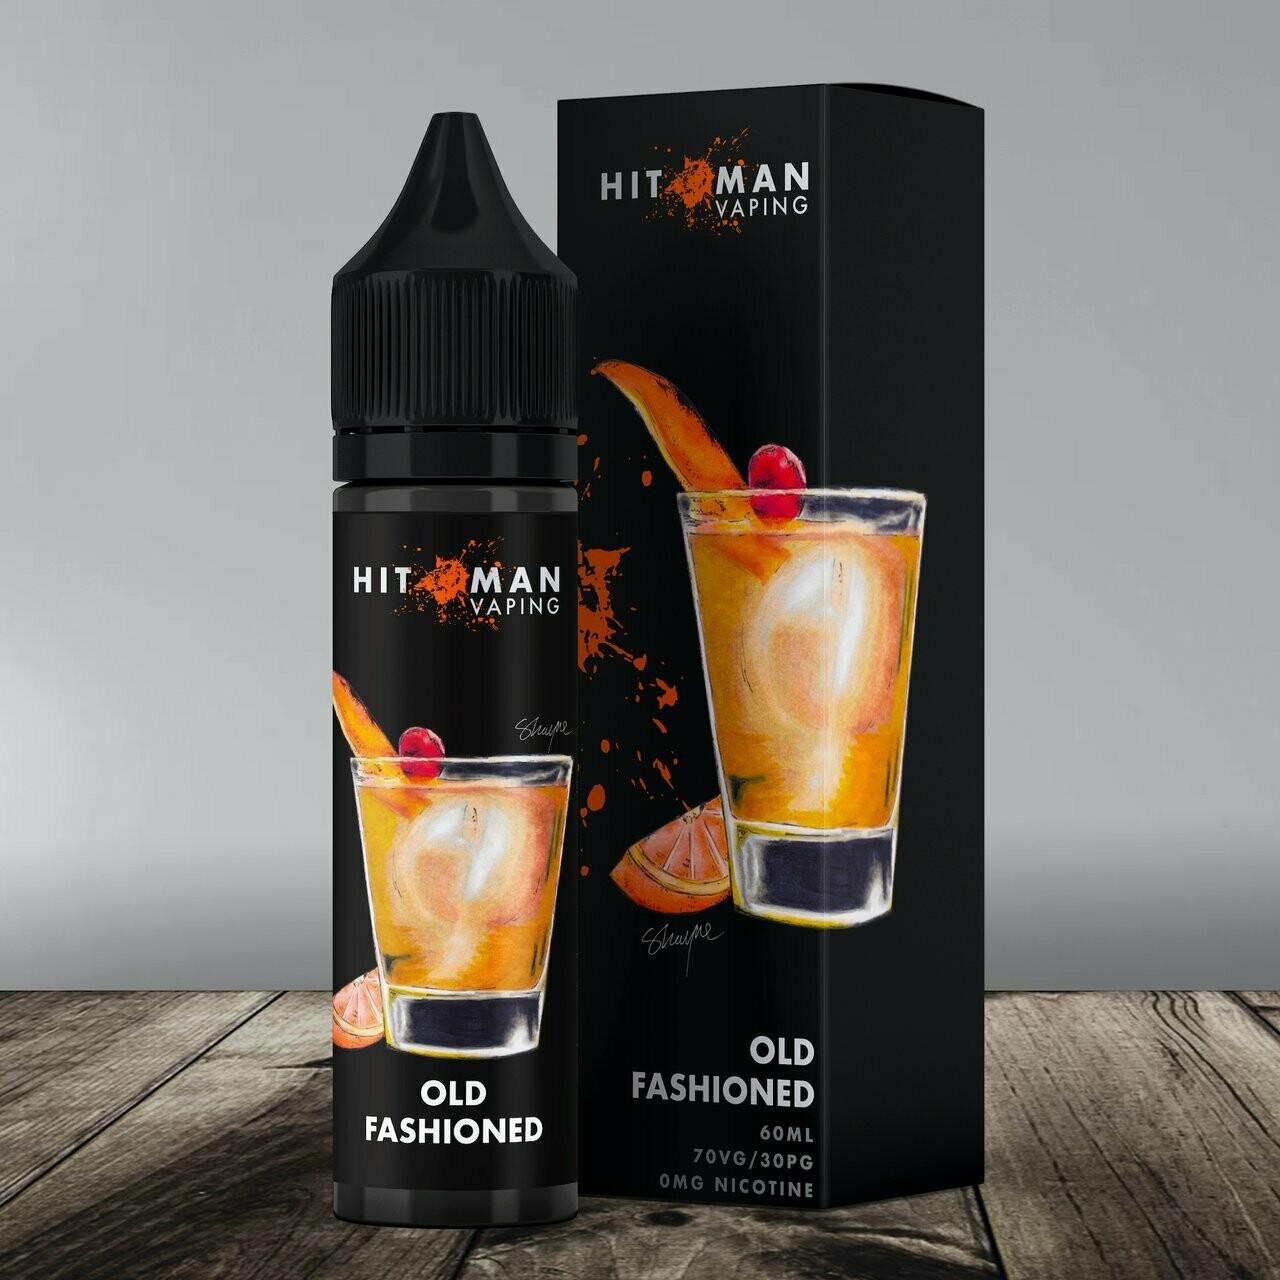 Hitman Vaping | Old Fashioned